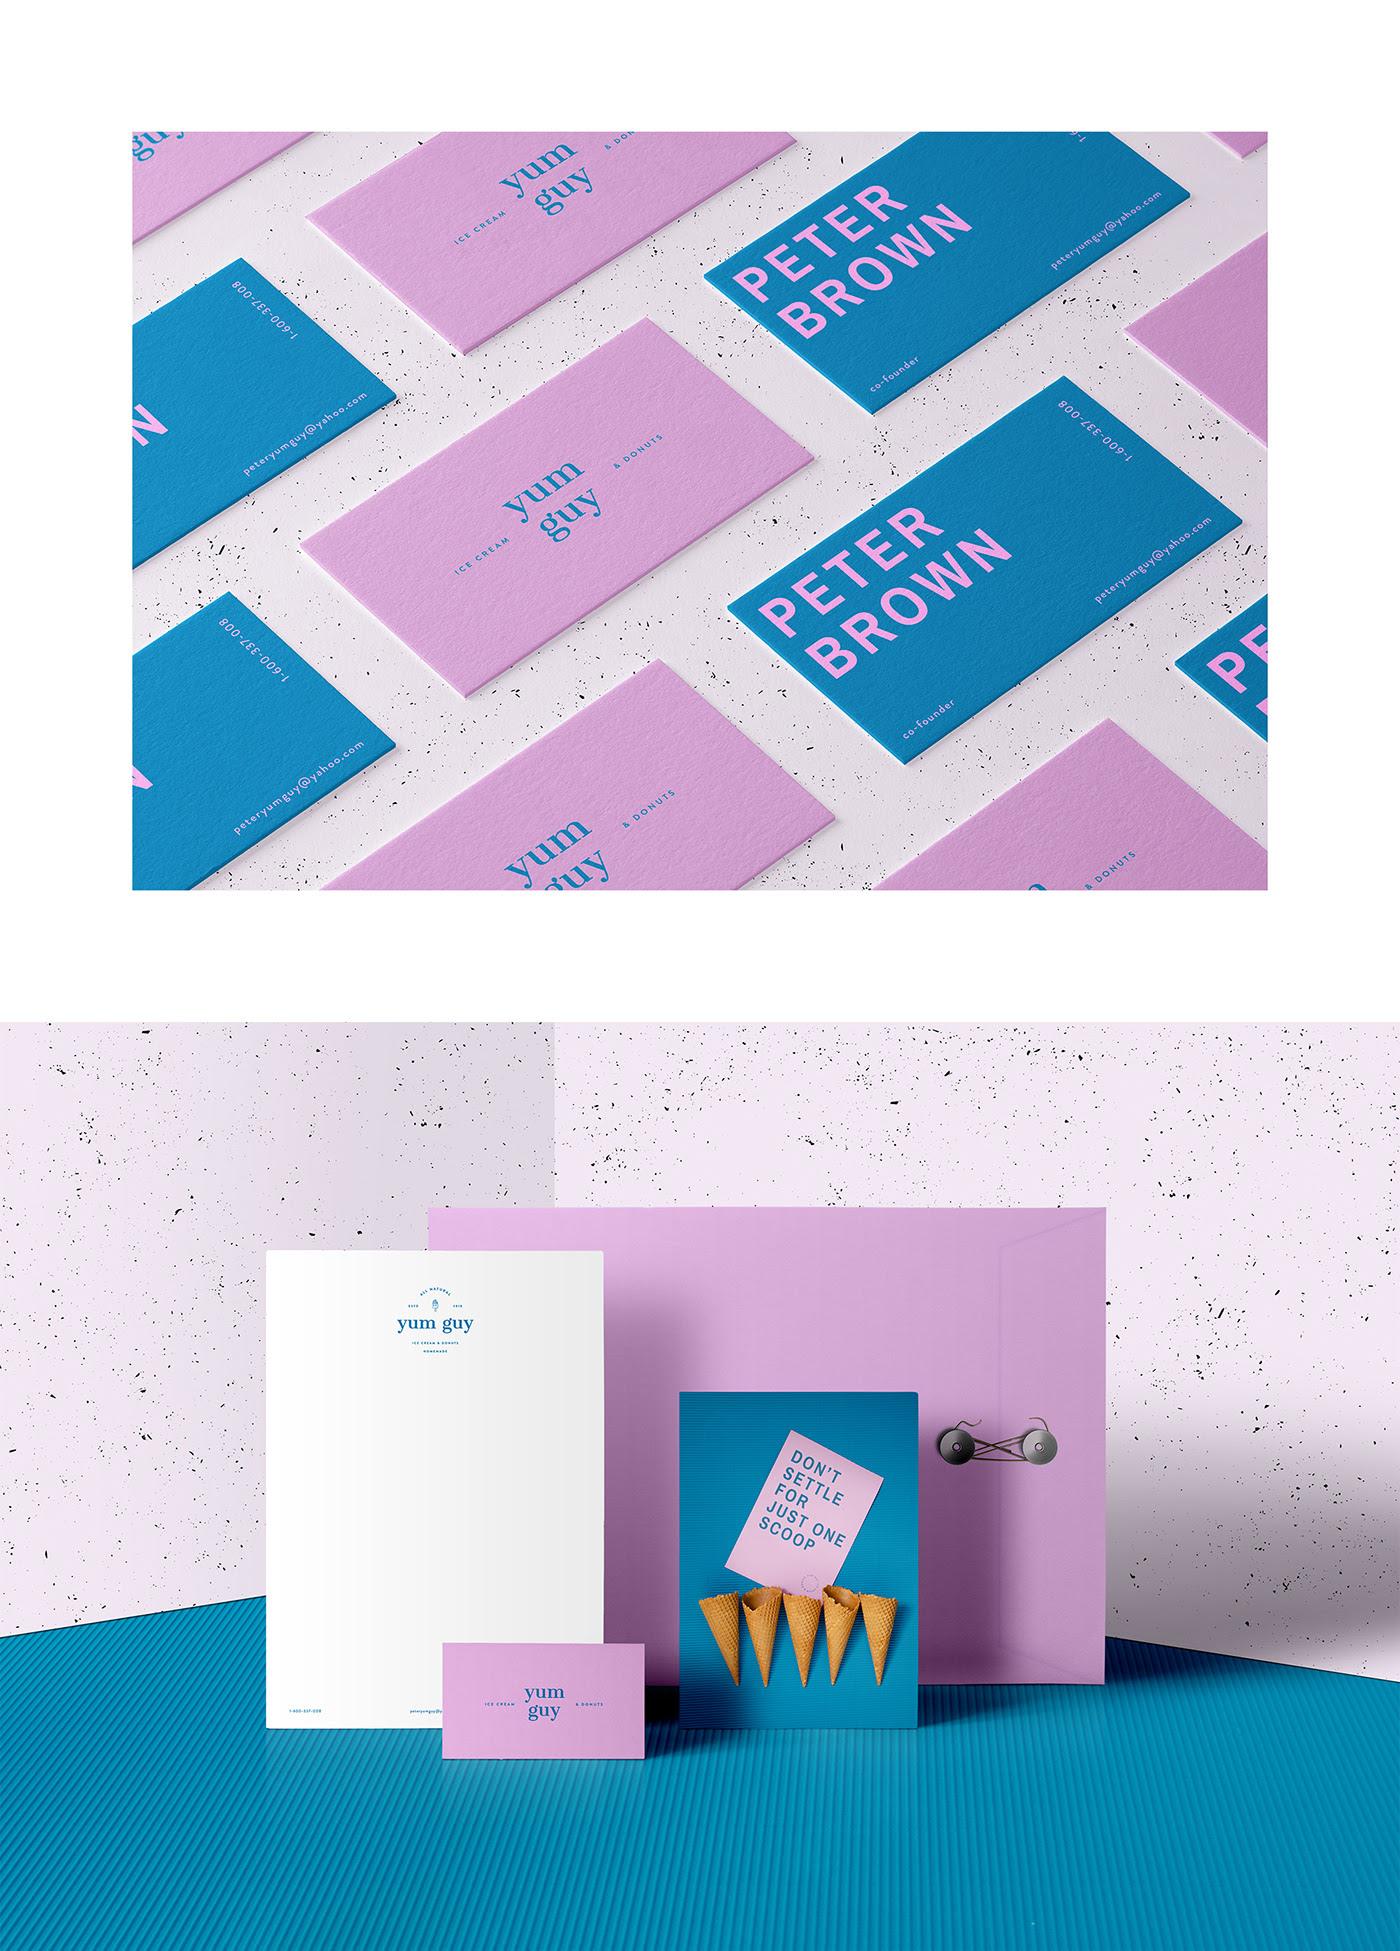 Bright & Fun Yum Guy Ice Cream Branding by STRETCHD